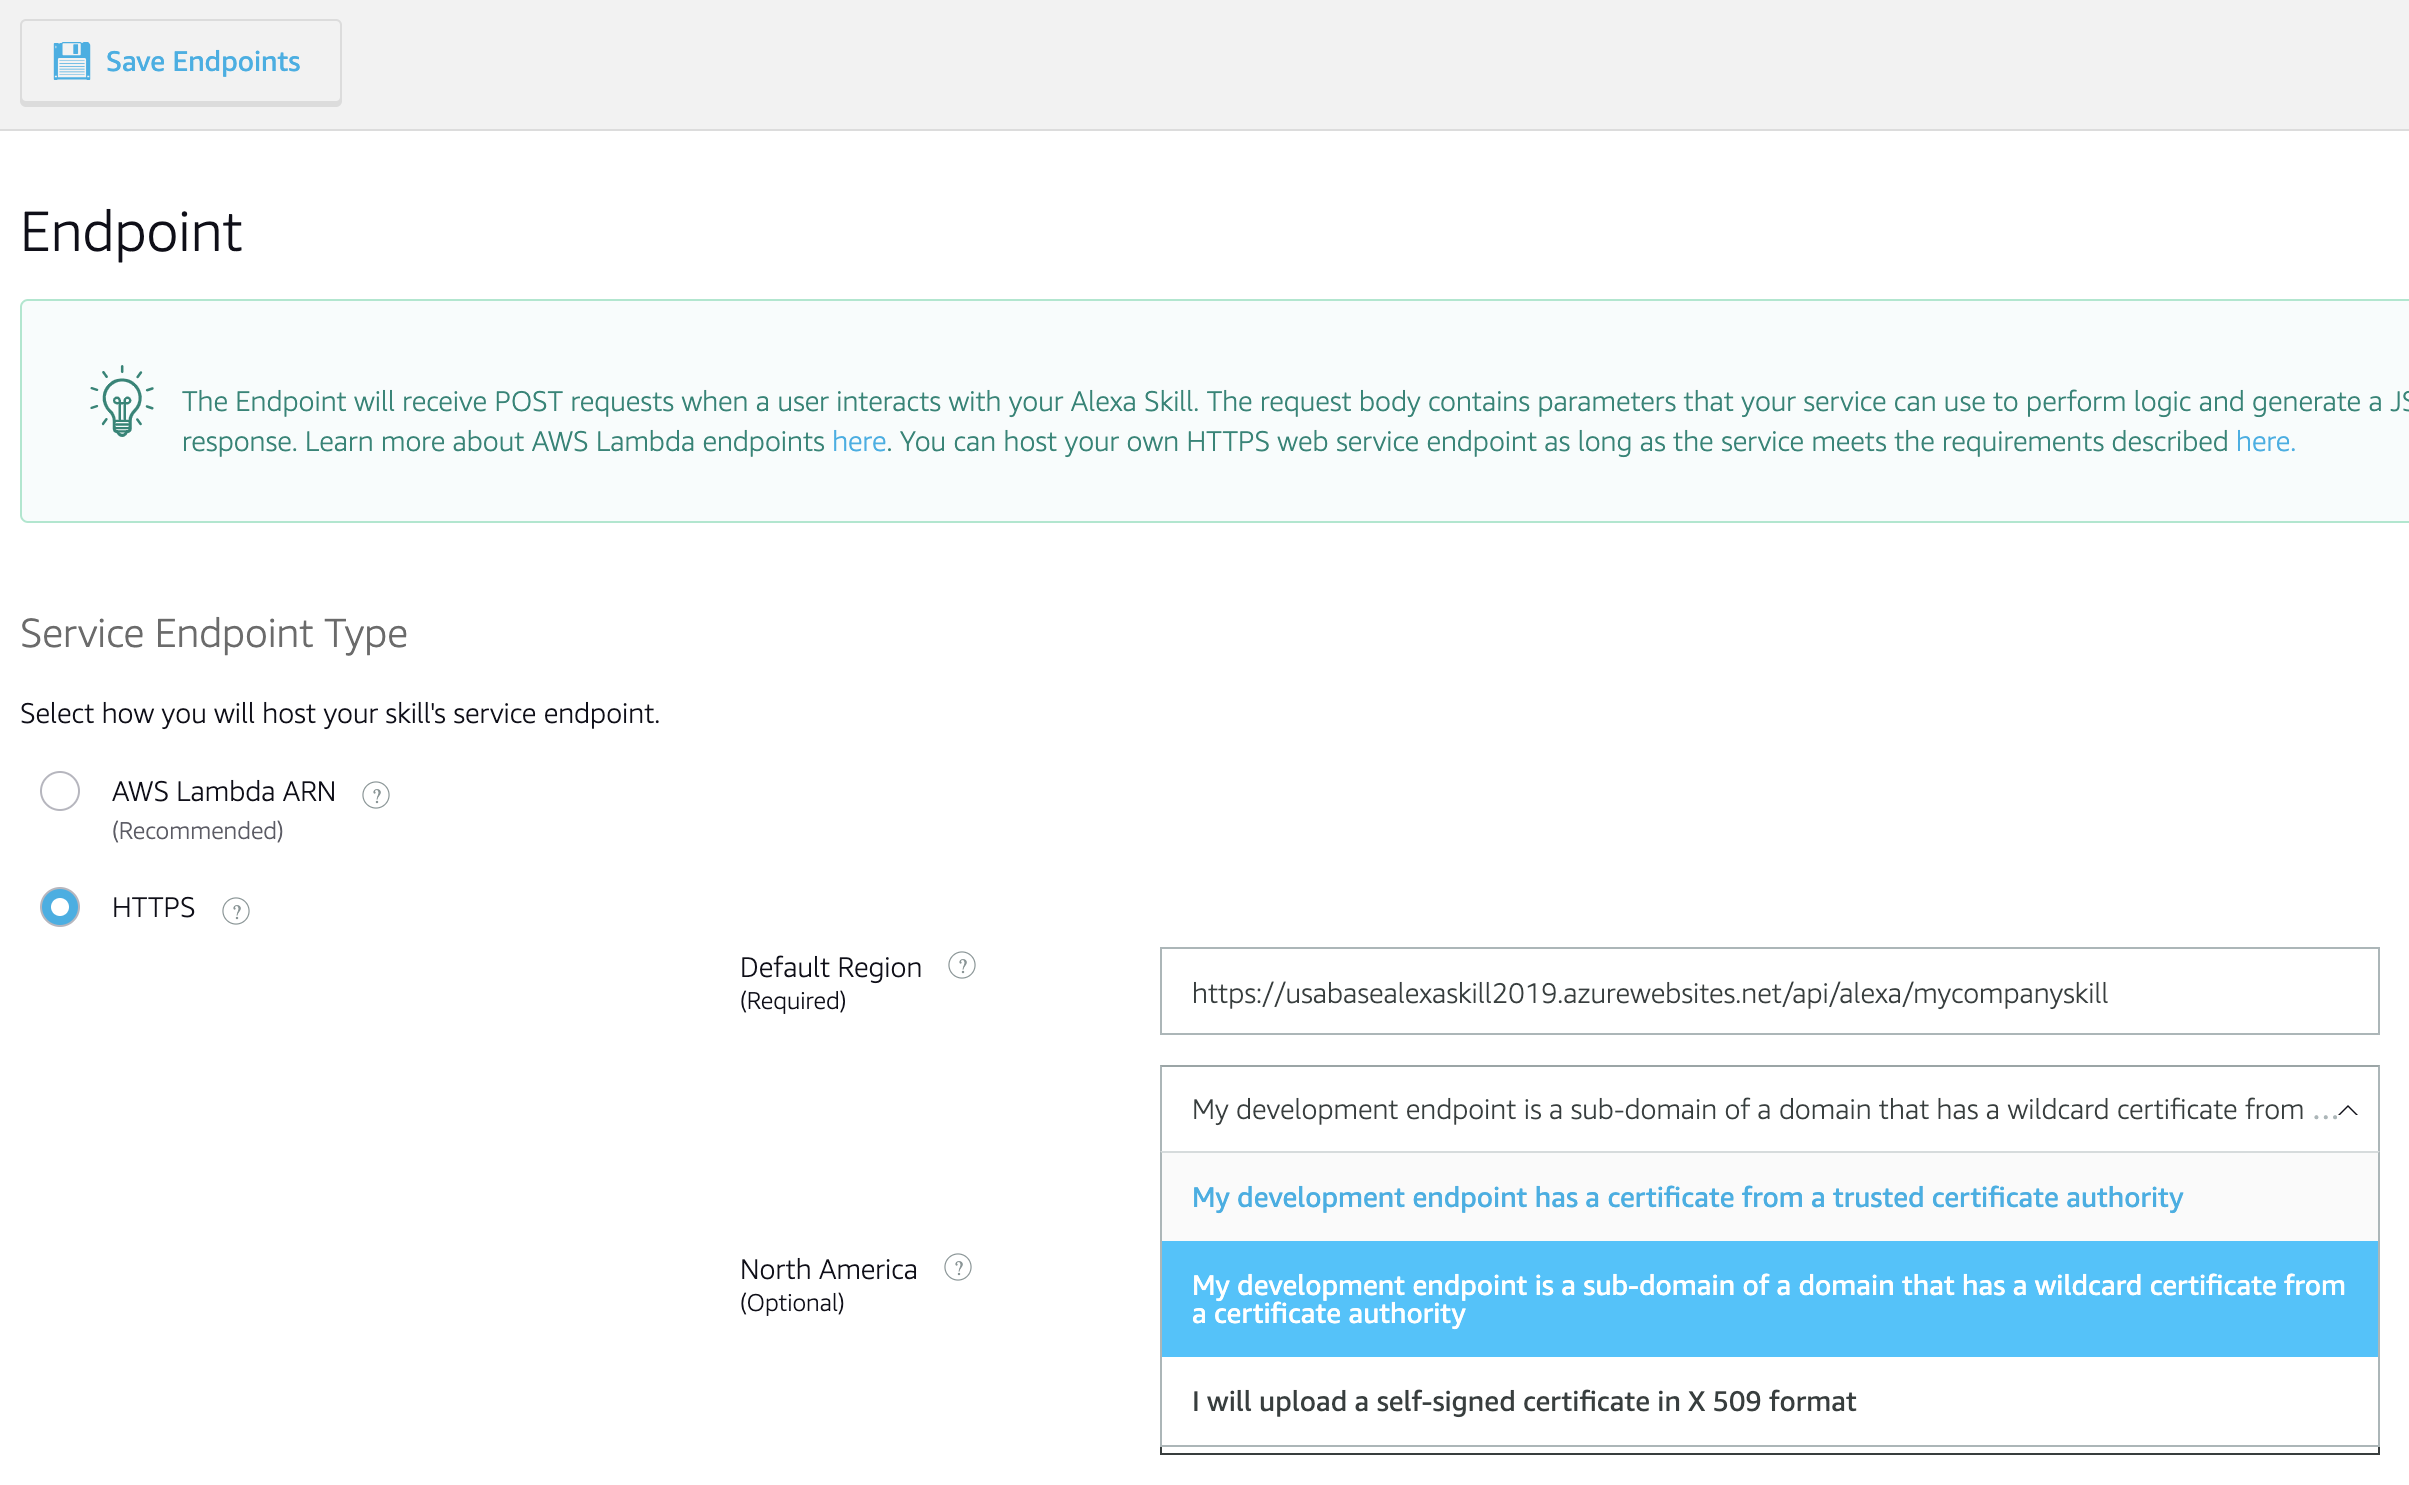 User Account Linking in Alexa with ASP NET Web API | Okta